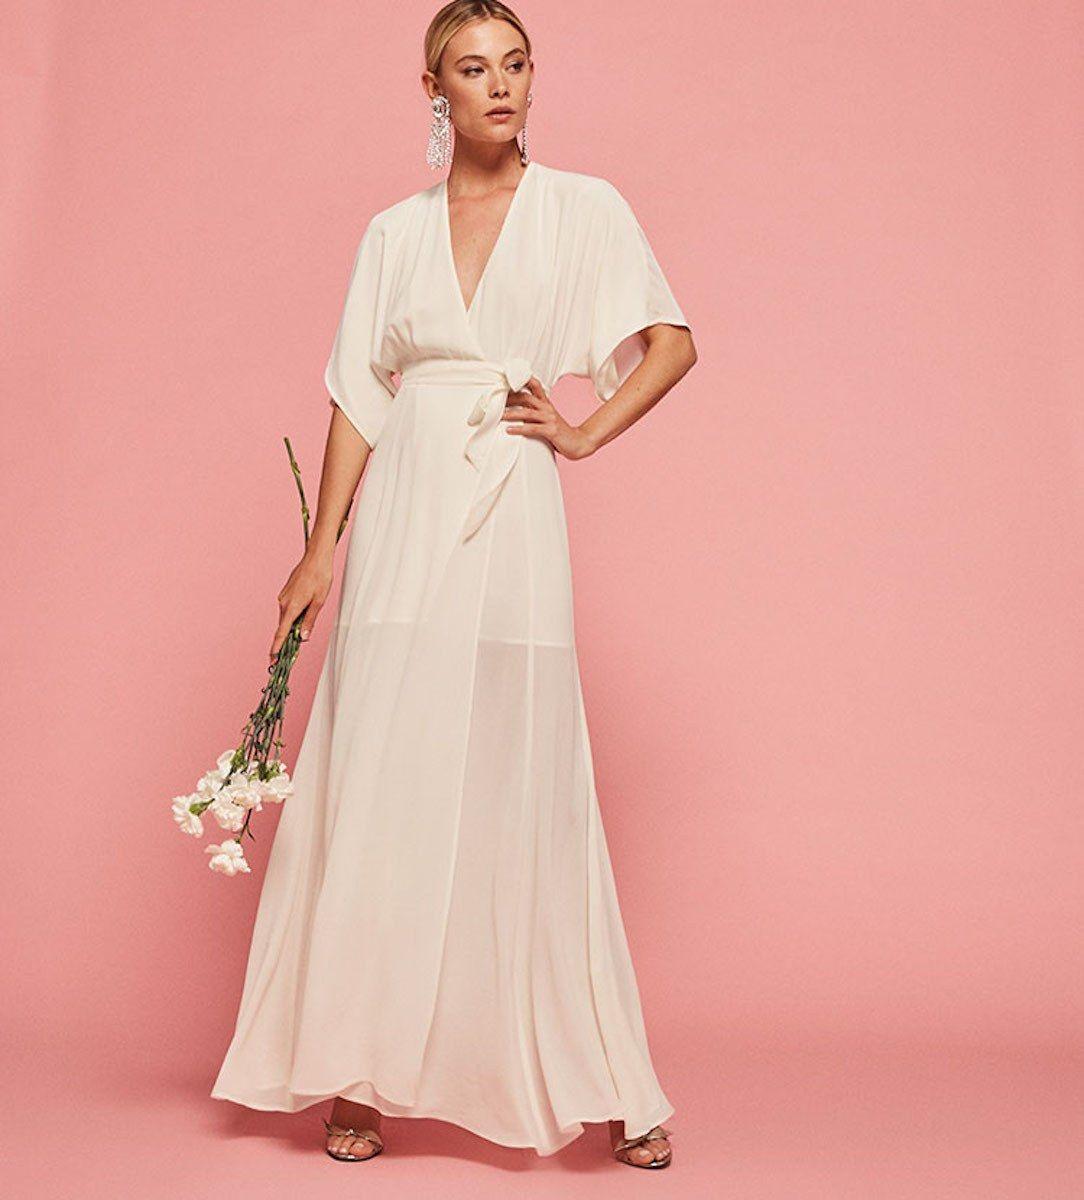 Beach wedding party dresses   Wedding Dresses Perfect for a Beach Wedding  Beach weddings